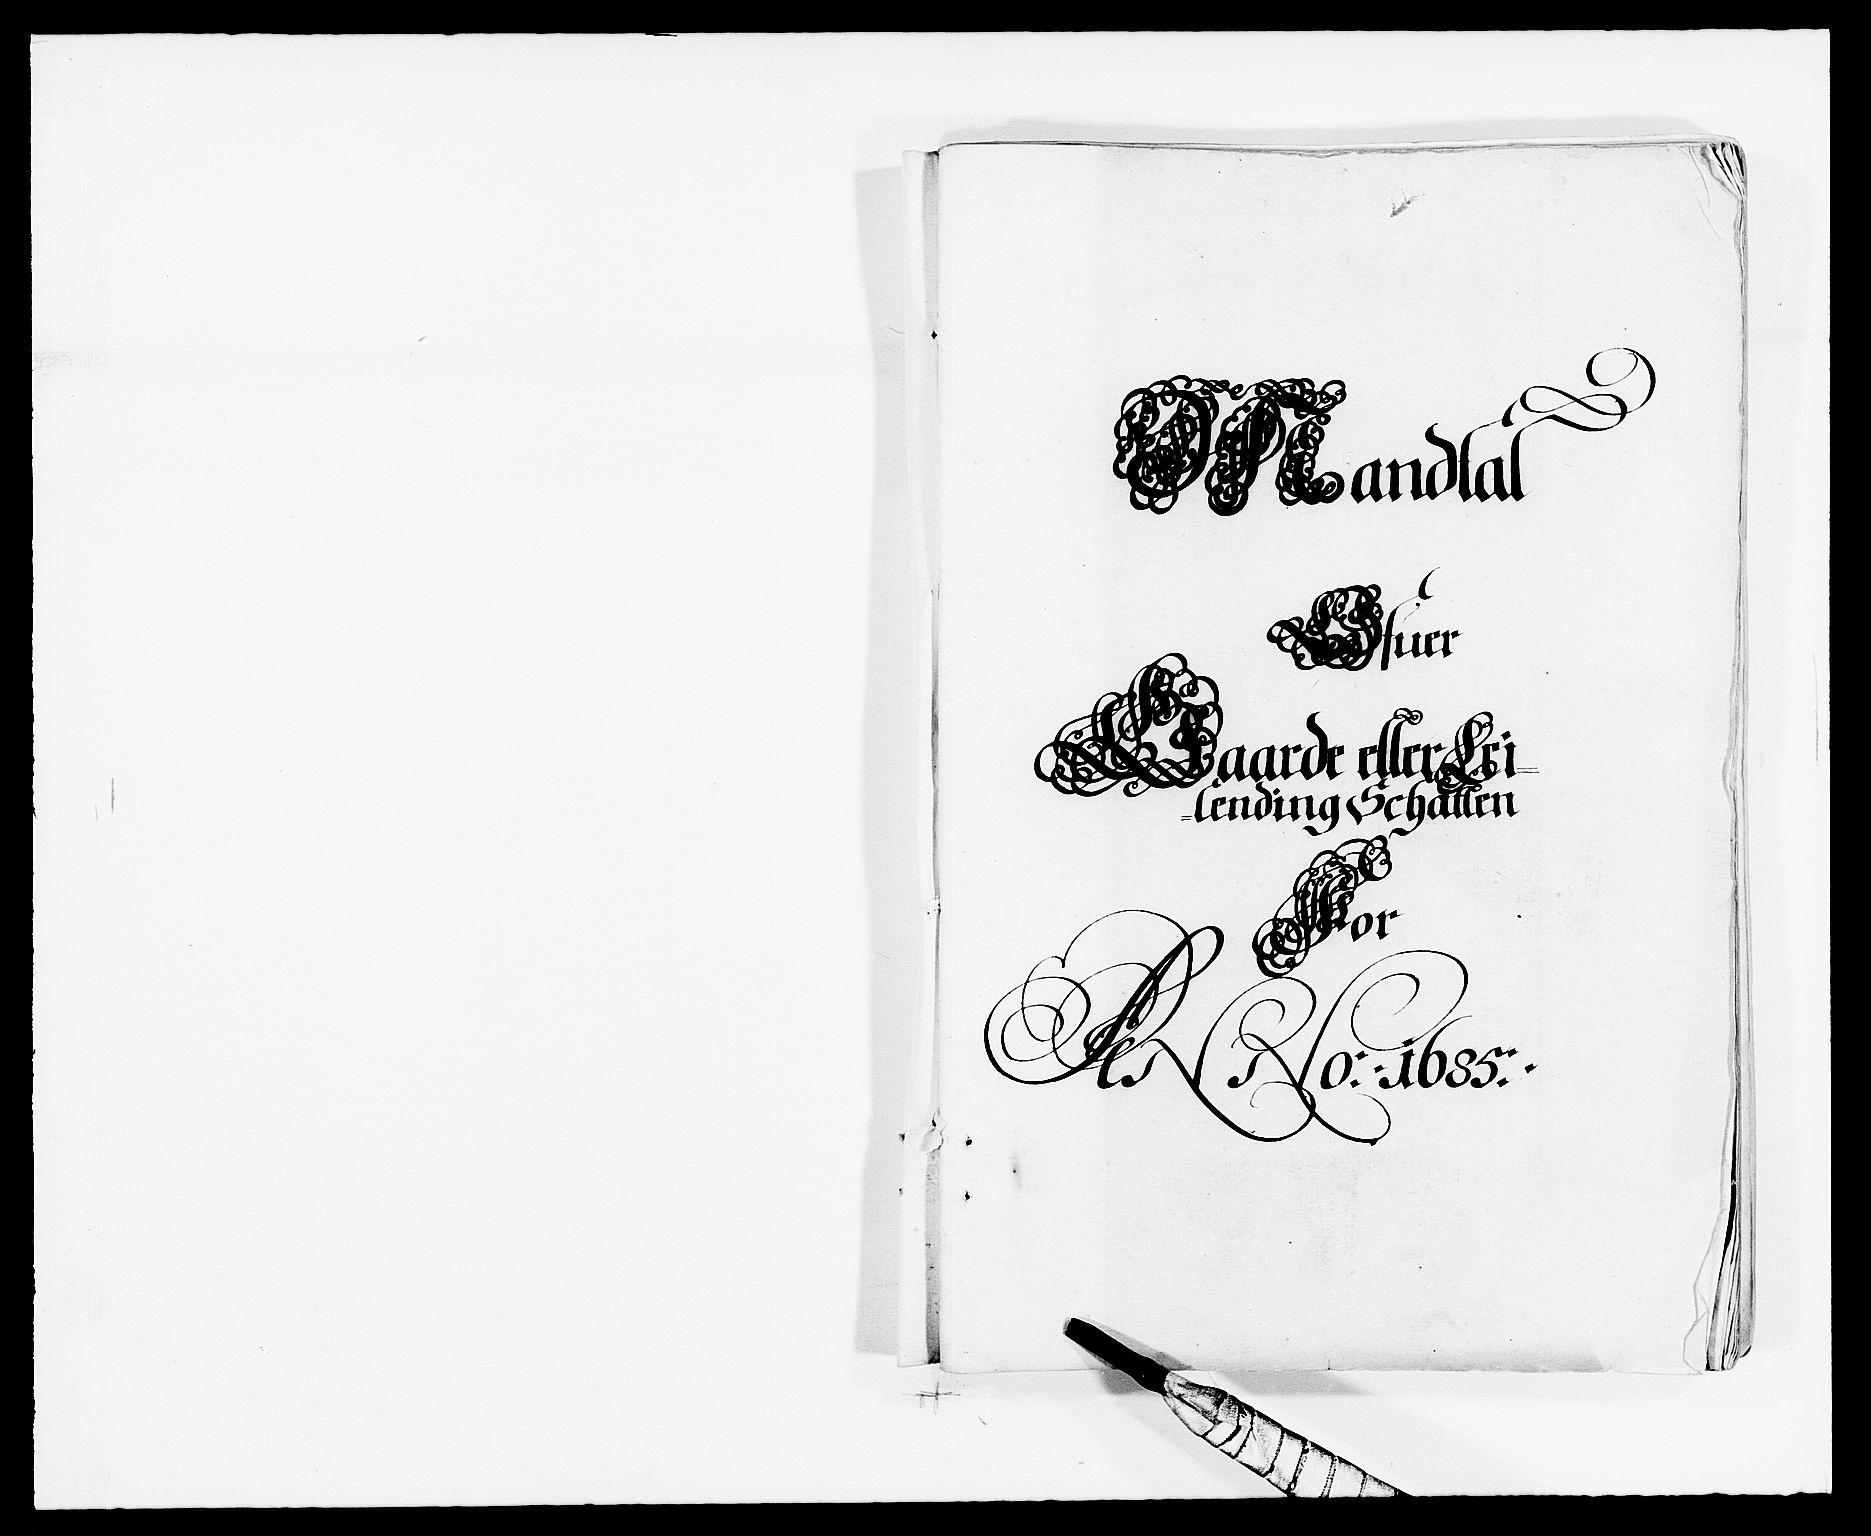 RA, Rentekammeret inntil 1814, Reviderte regnskaper, Fogderegnskap, R32/L1856: Fogderegnskap Jarlsberg grevskap, 1685, s. 10